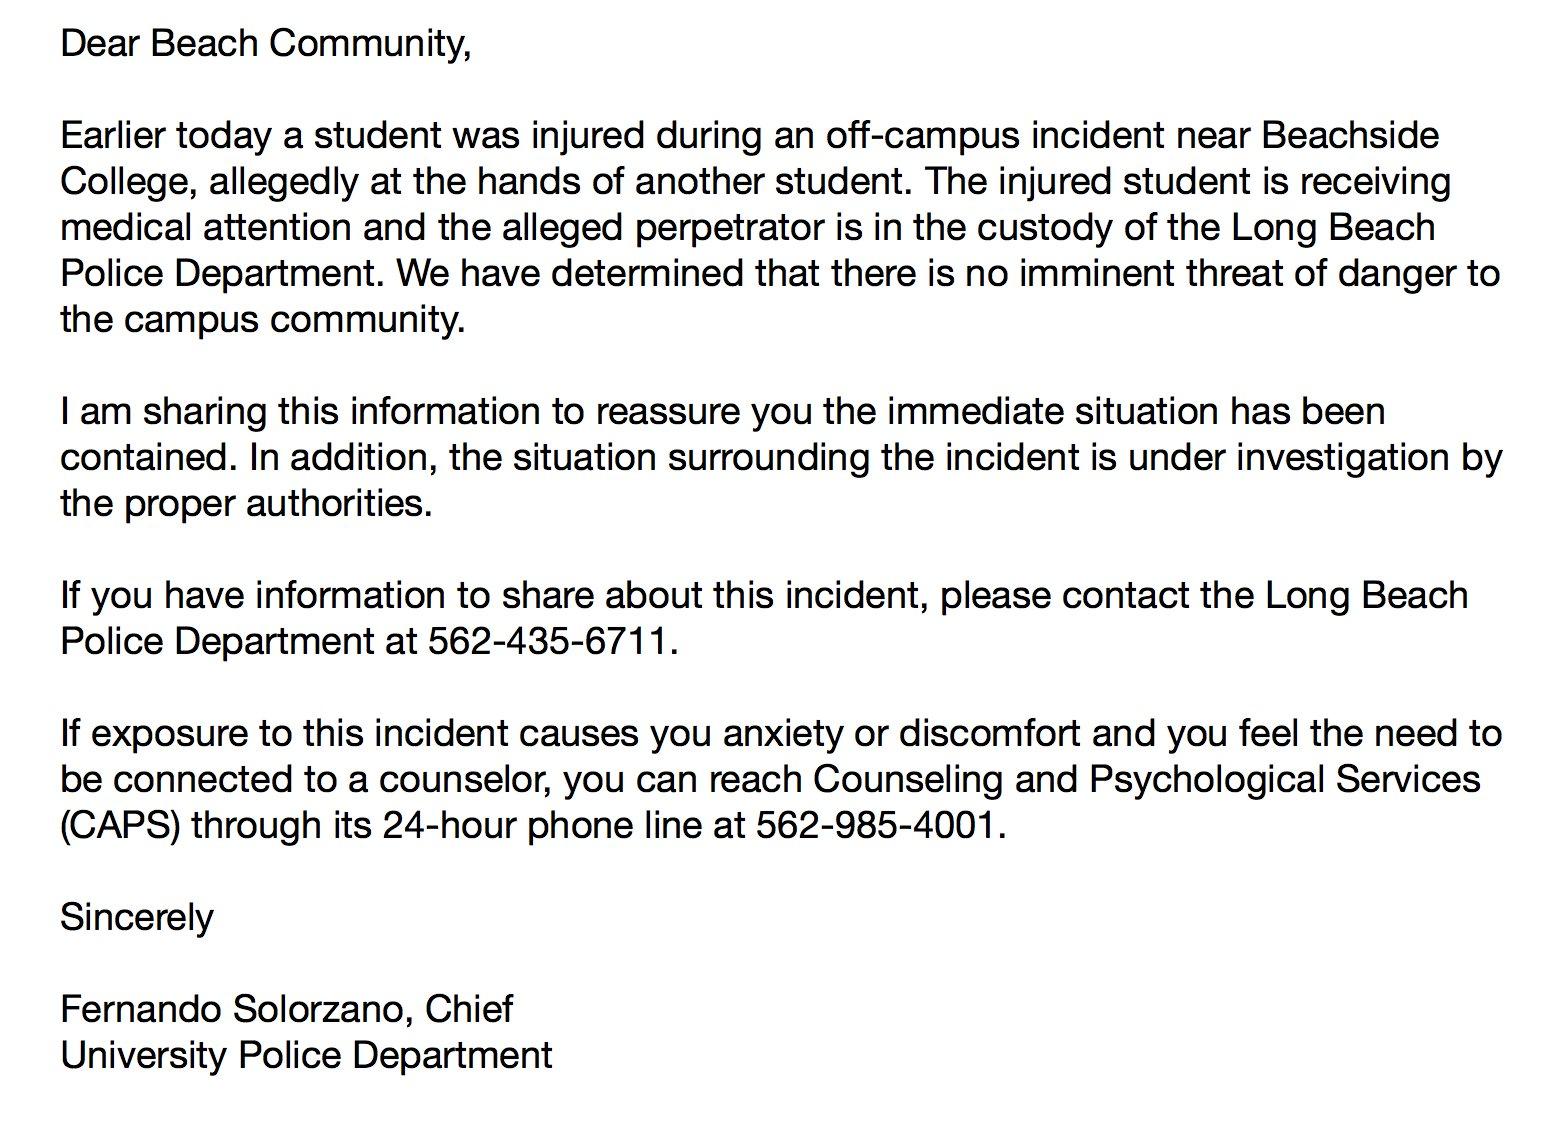 .@READYBEACH released an email regarding a student injury. #CSULB #49erNow https://t.co/nZ4qmYIPfU